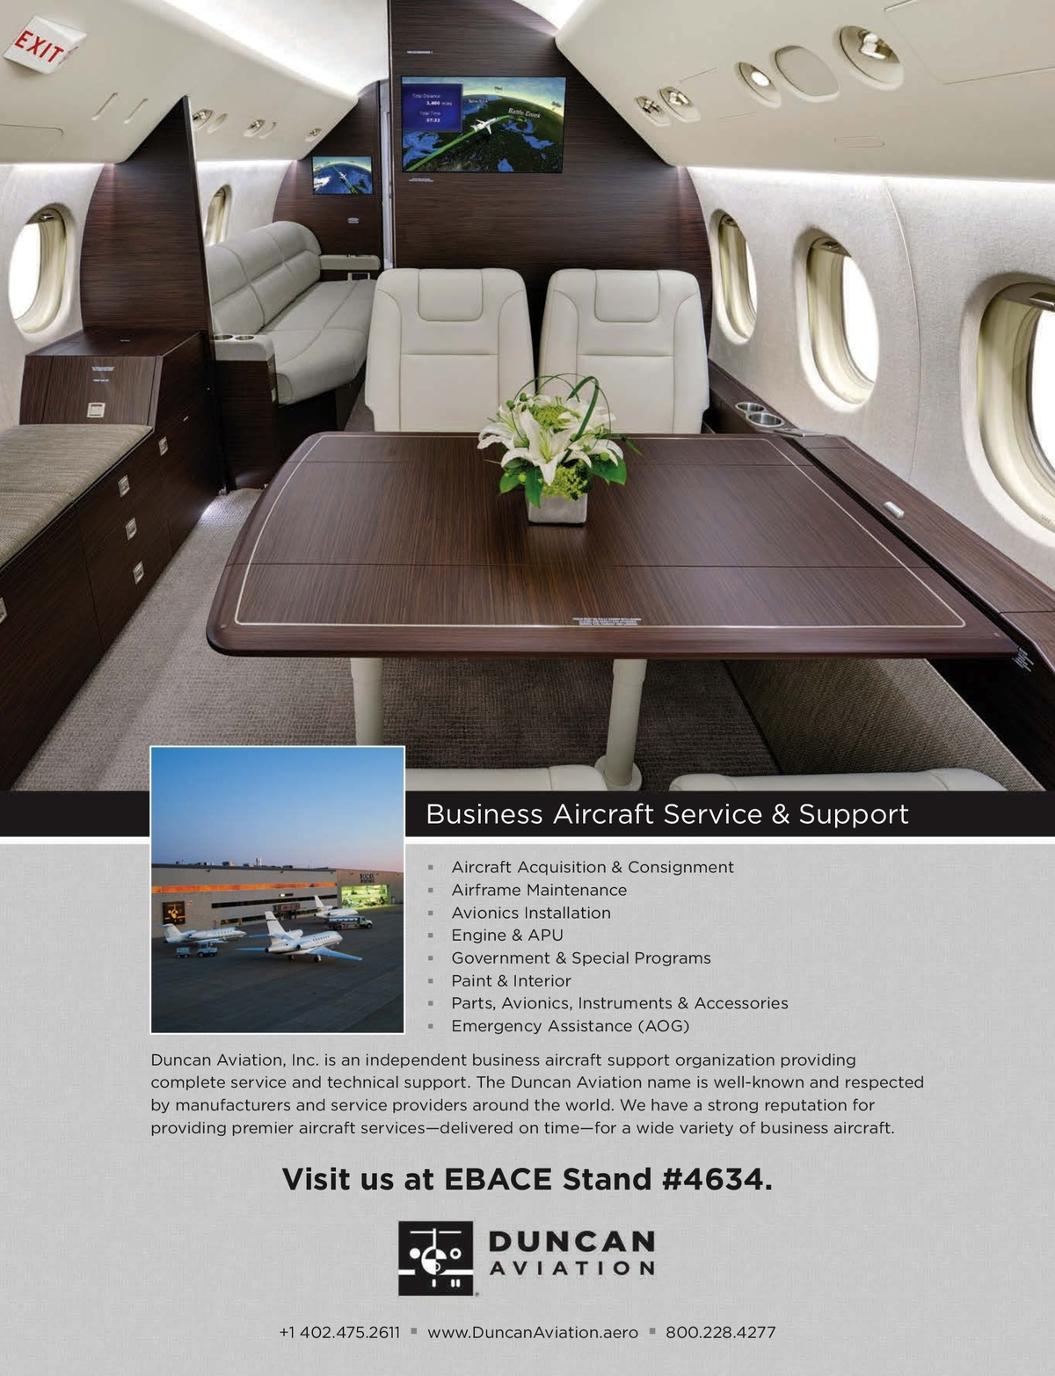 April 2014 Business Jet Interiors International - UKi